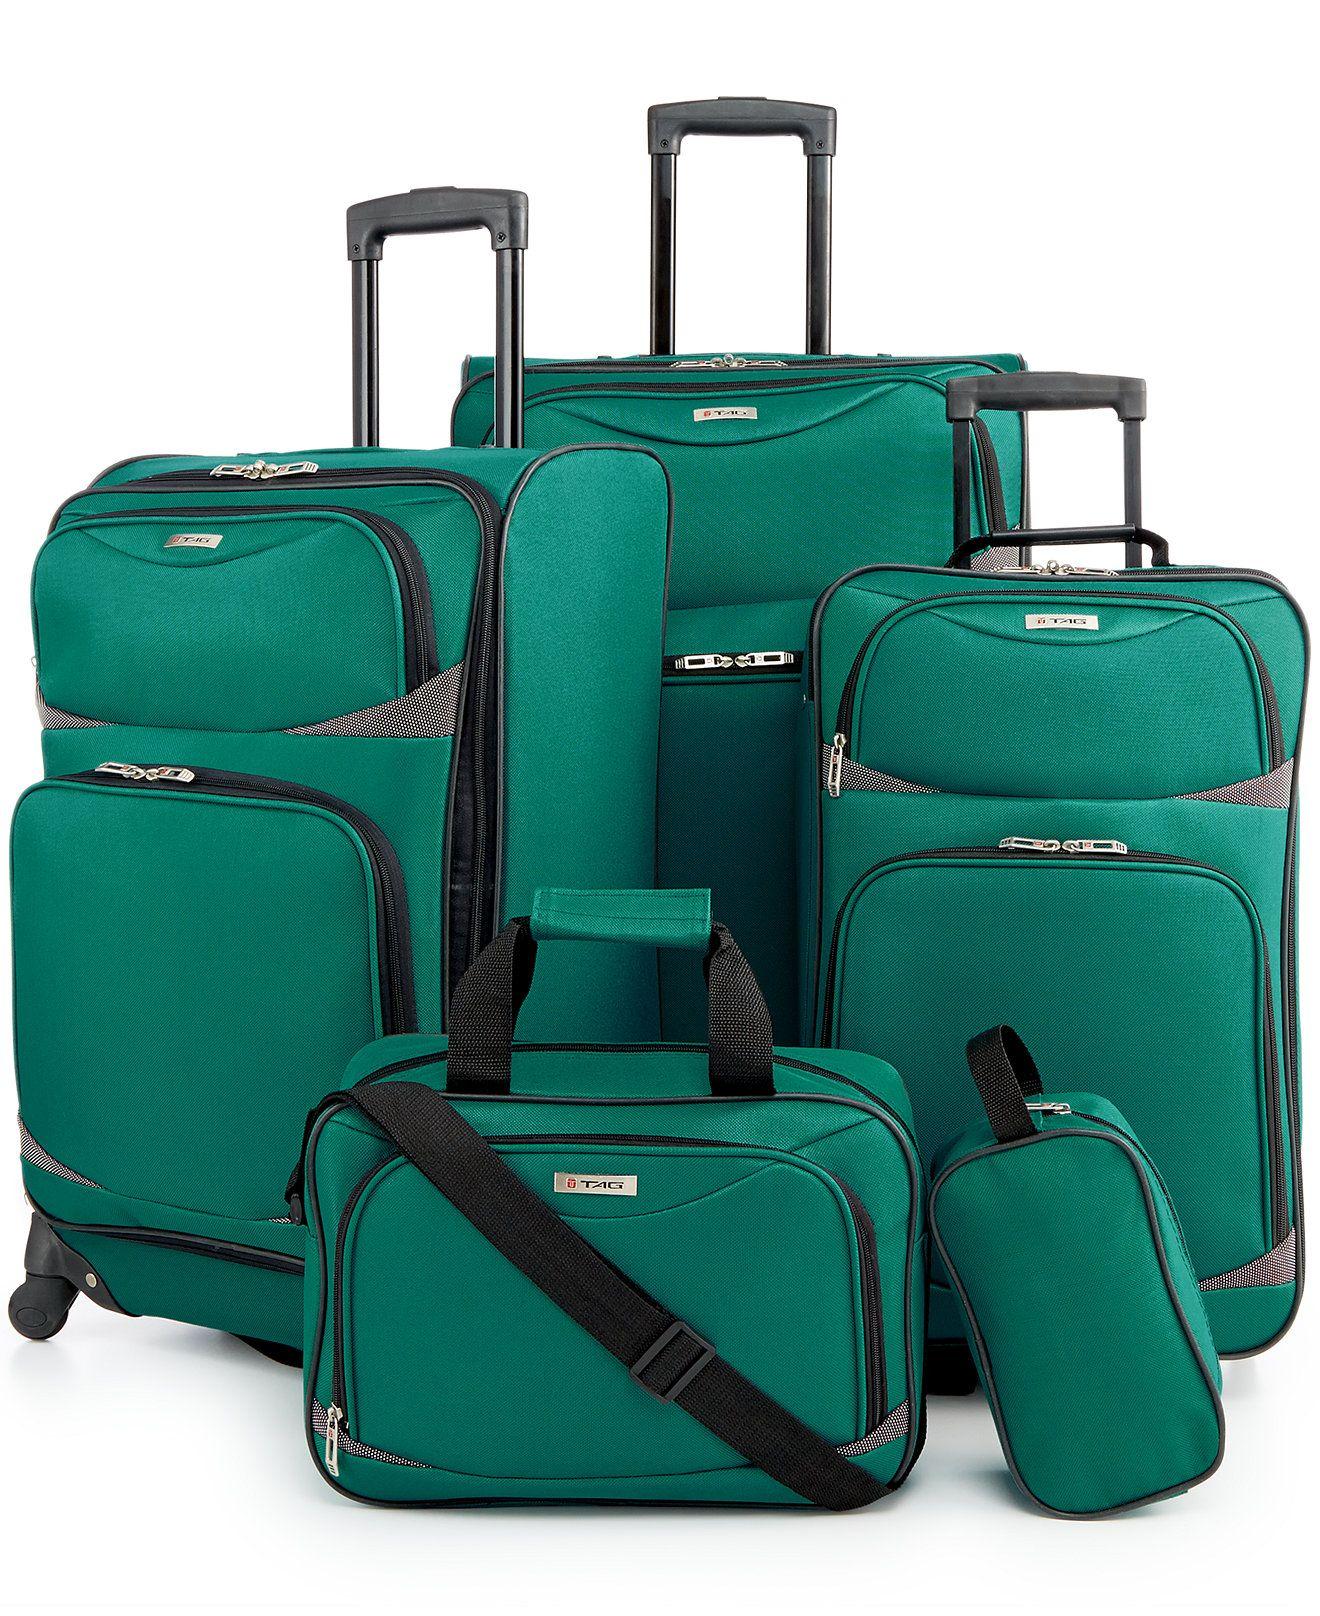 7353ef997d Tag Coronado II 5 Piece Spinner Luggage Set - Luggage Sets - luggage    backpacks - Macy s